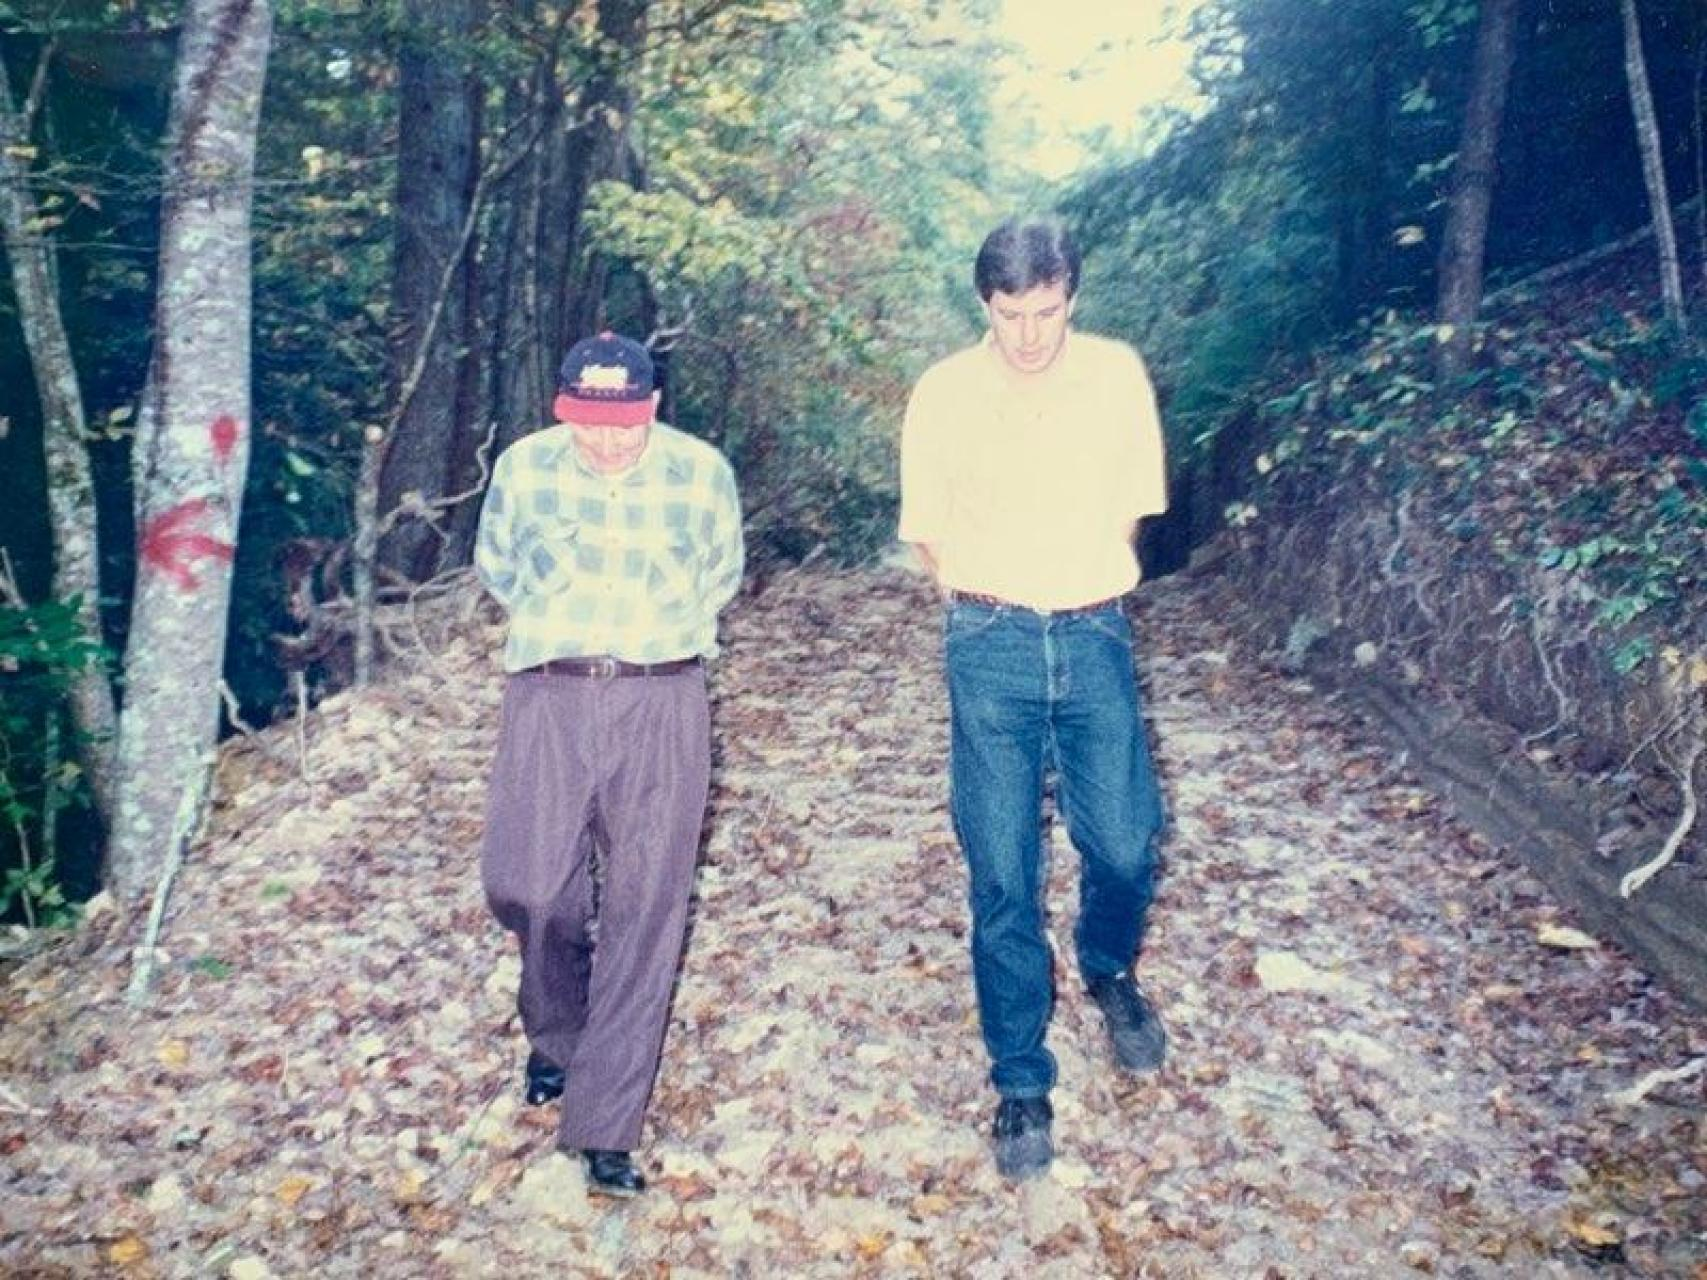 Wayne Martin and Doug Wallin walking on a wooded path